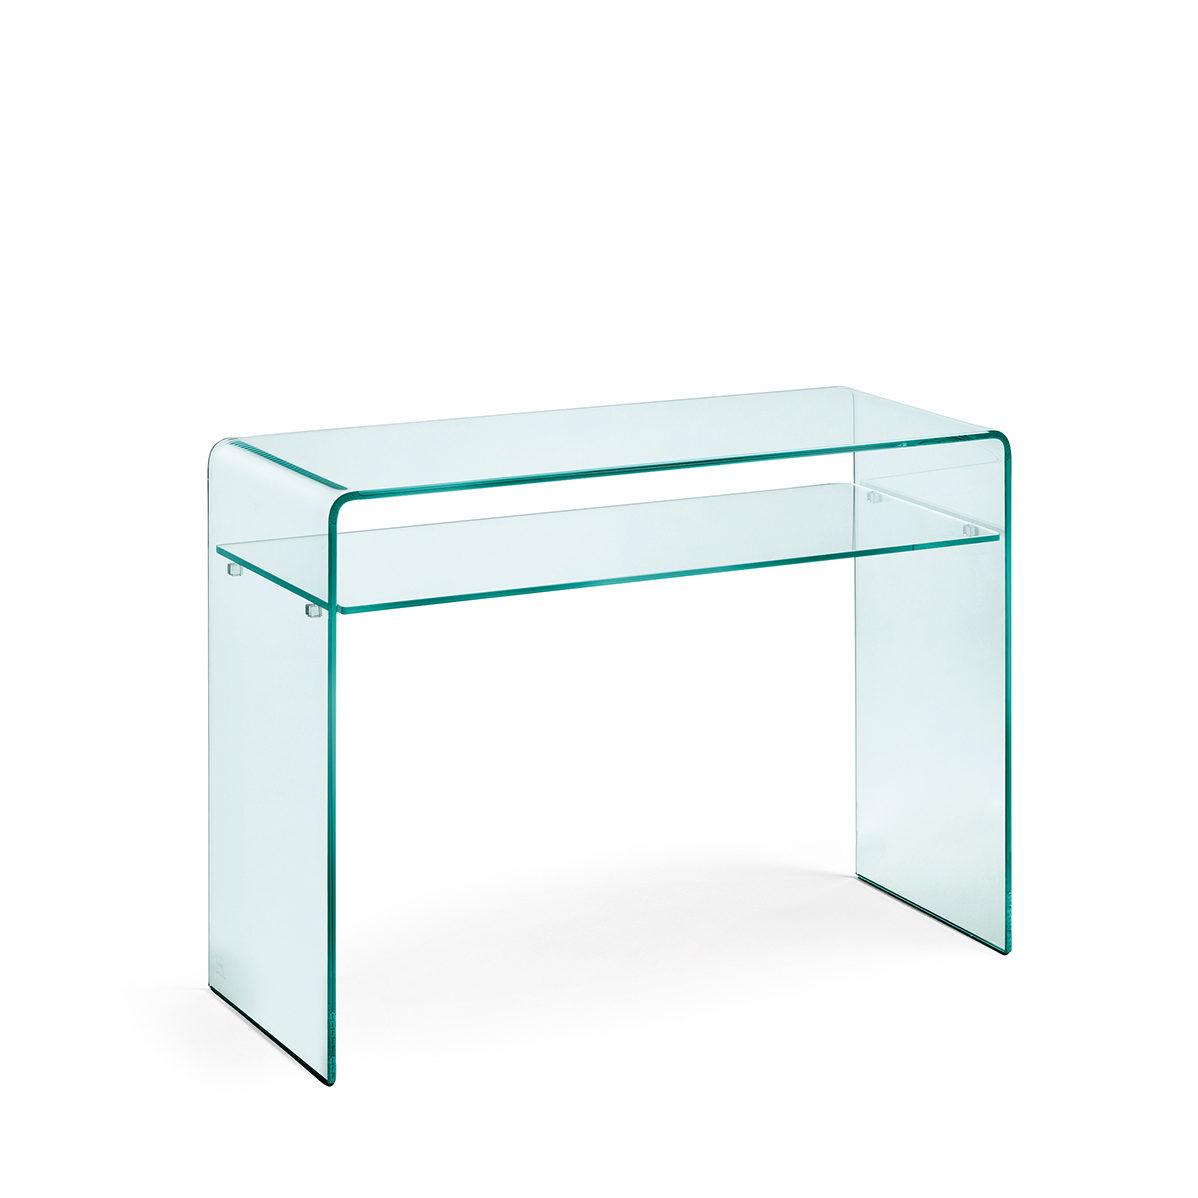 Design Glazen Sidetable.Fiam Glazen Design Side Table Rialto